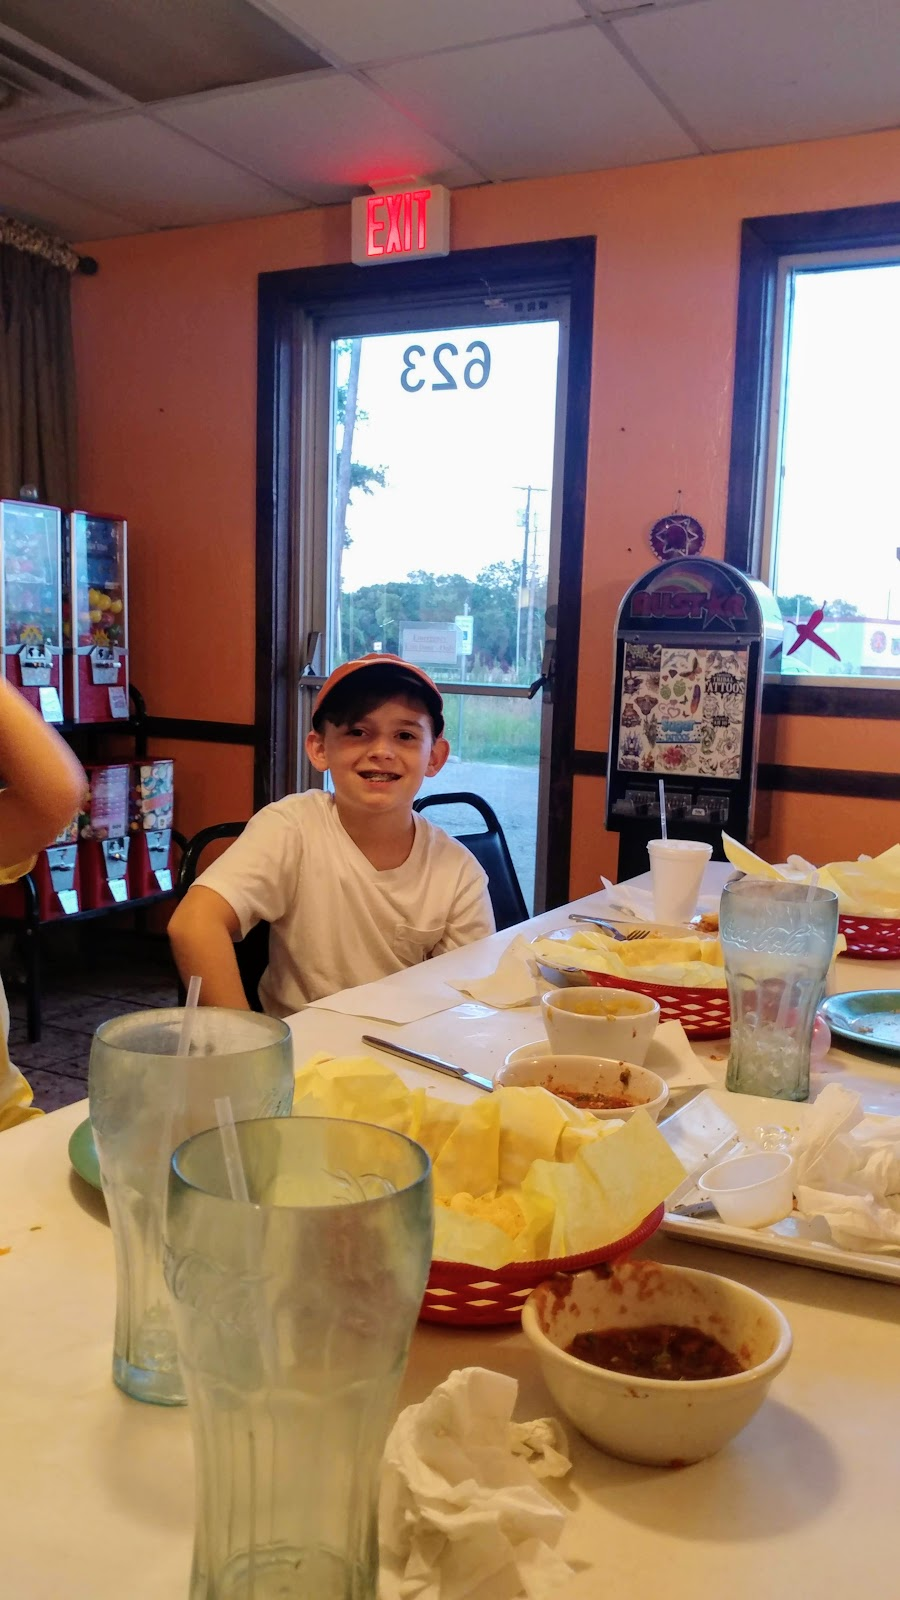 Chilitos - cafe    Photo 8 of 10   Address: 621 S Lake Dallas Dr, Lake Dallas, TX 75065, USA   Phone: (940) 321-5522